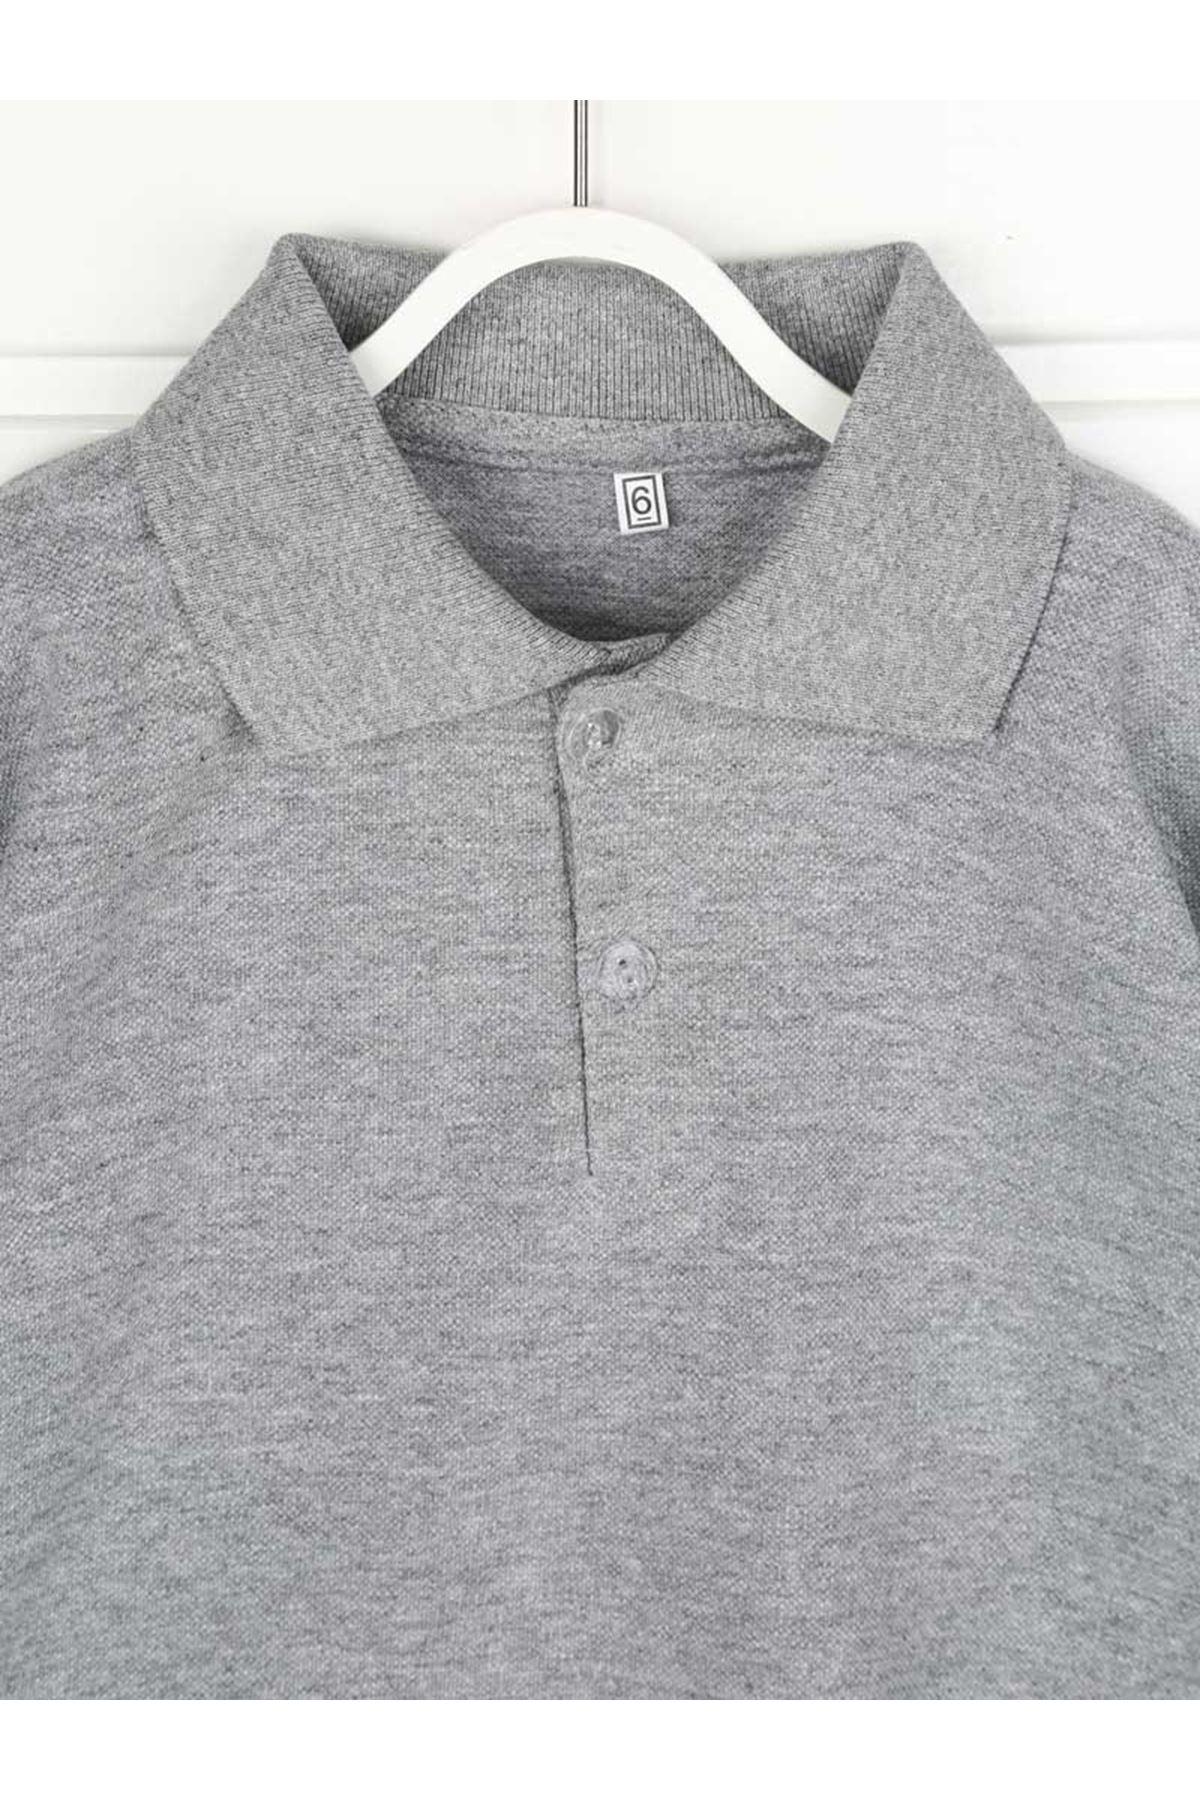 Gri Polo Yaka Pamuklu Çocuk Basic Tişört